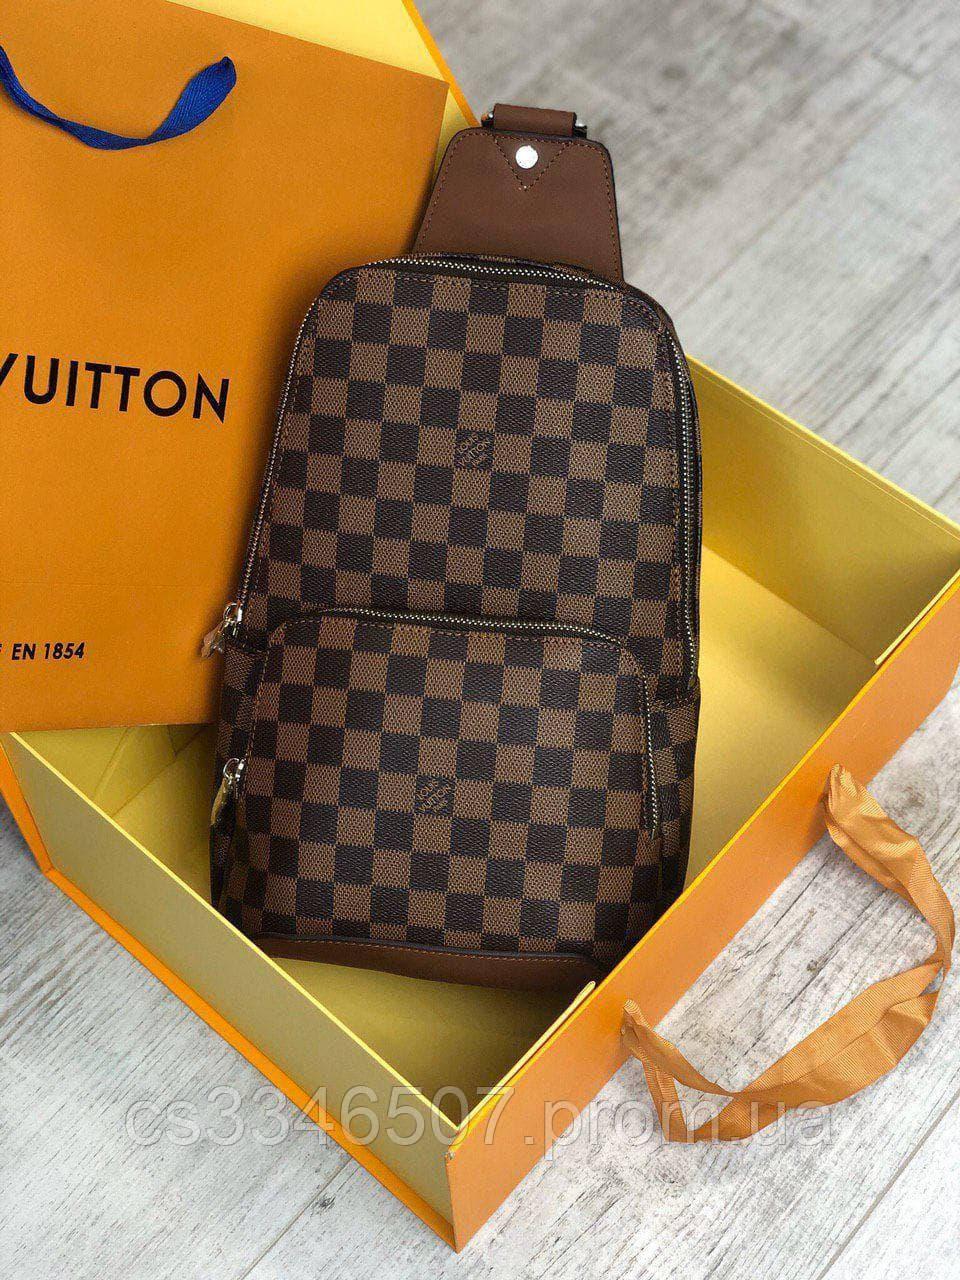 Мужская сумка слинг Louis Vuitton. Мужская бананка Луи Виттон